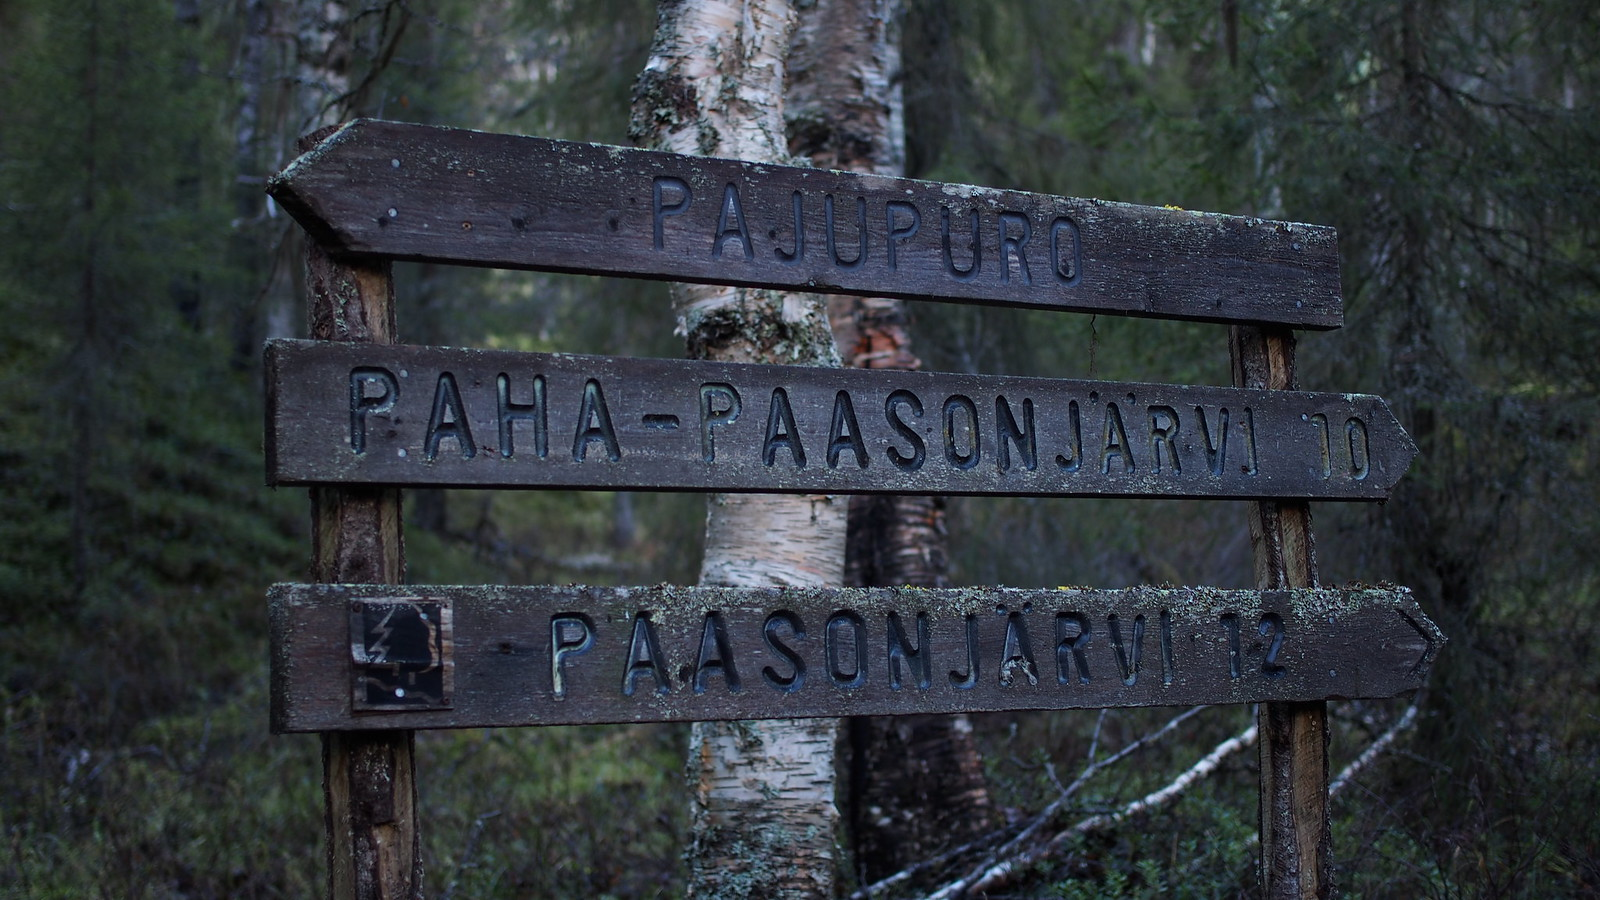 PA032194